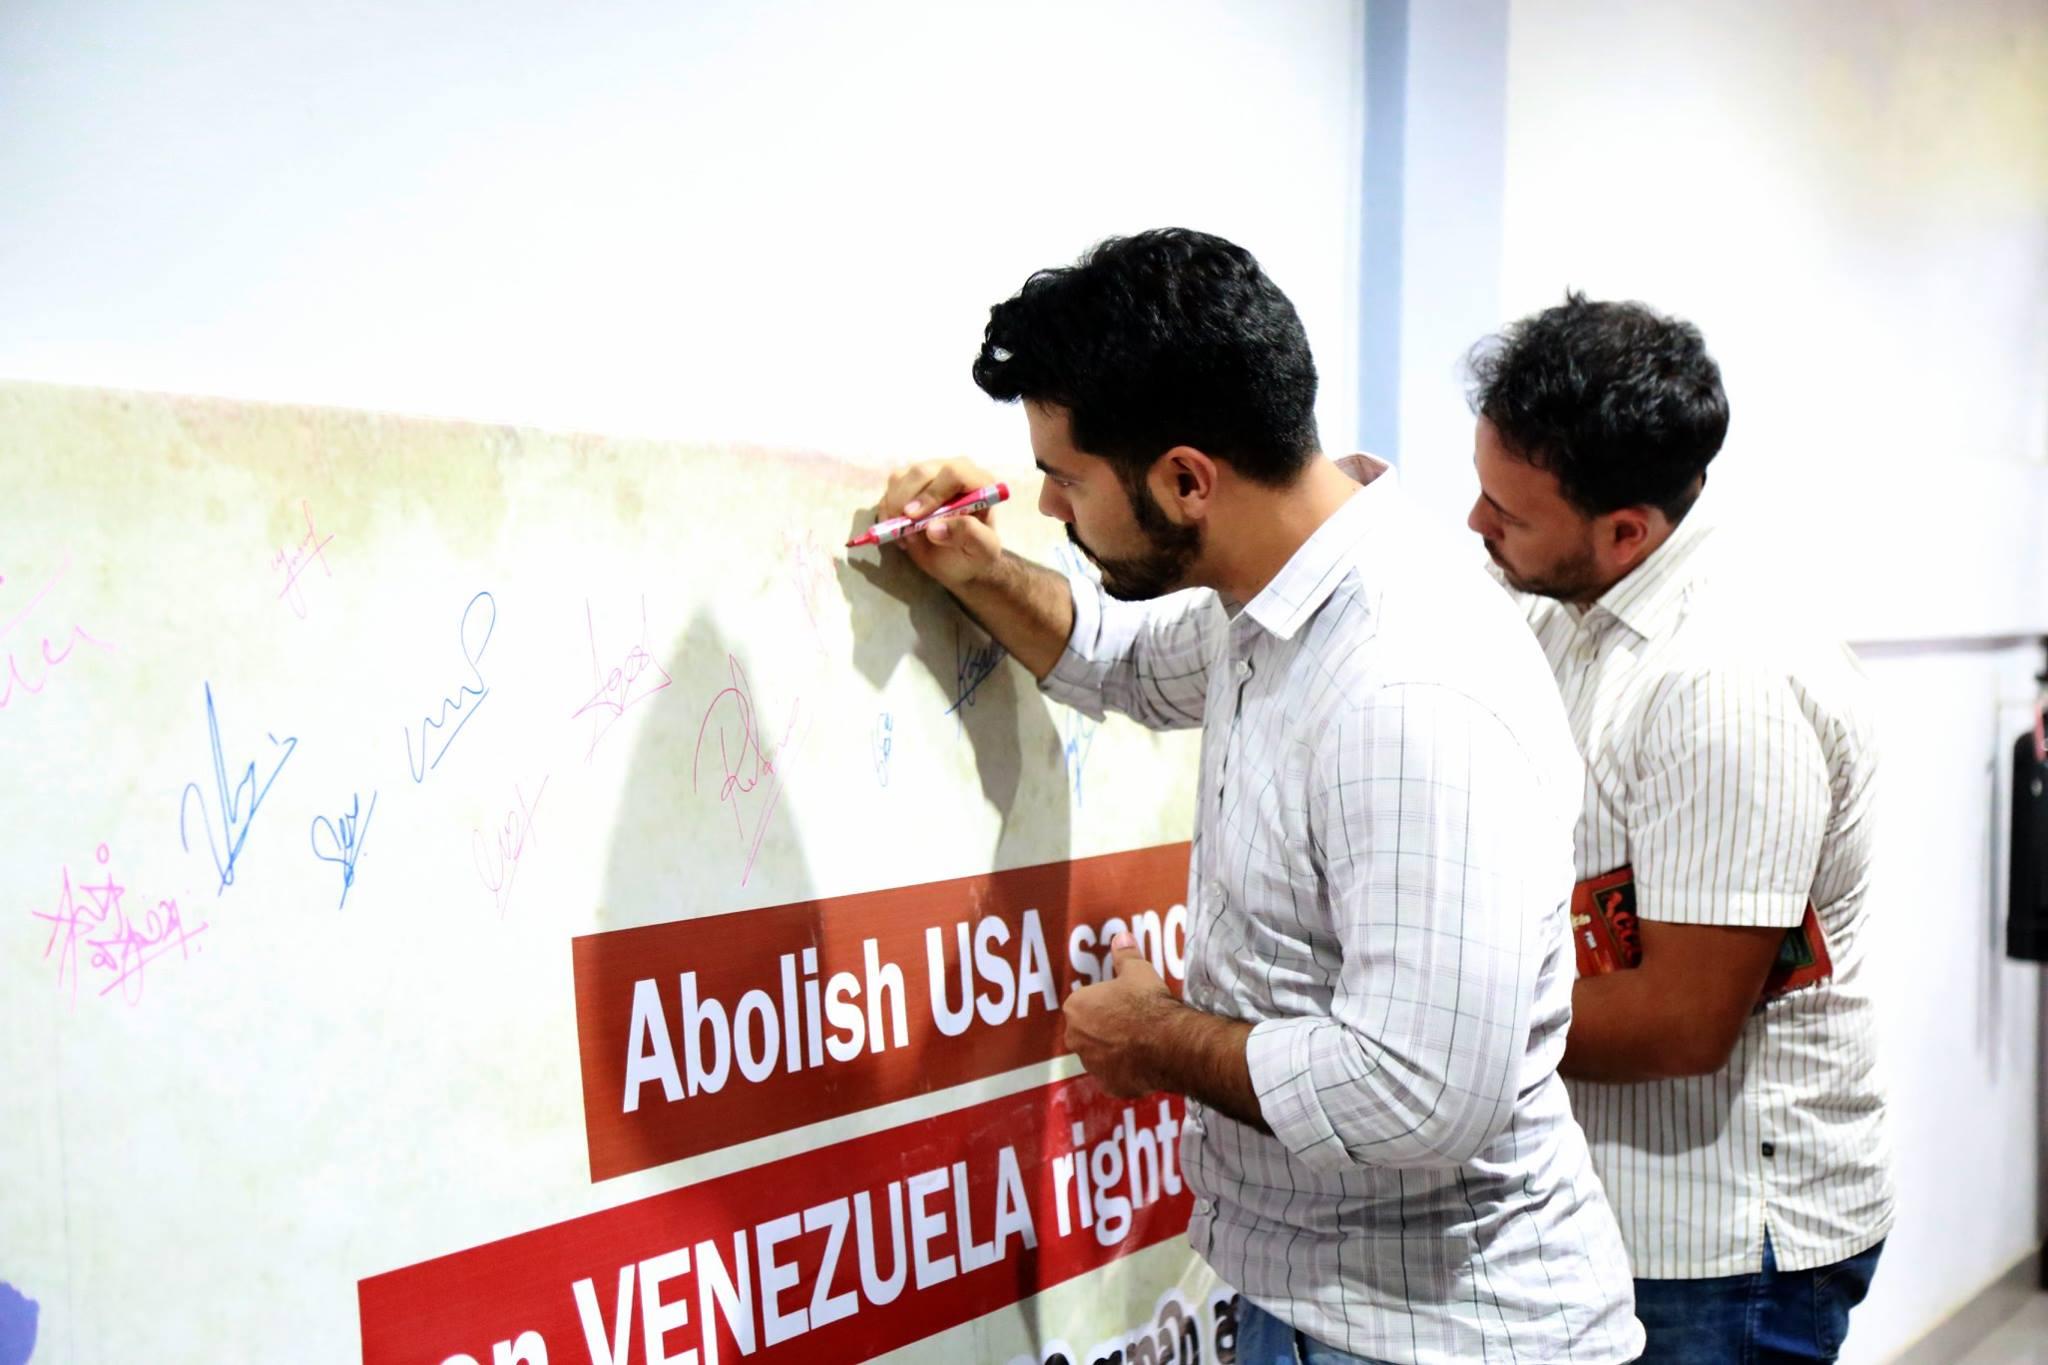 Venezuela-with-Sri-Lanka-2018.05.01-9h